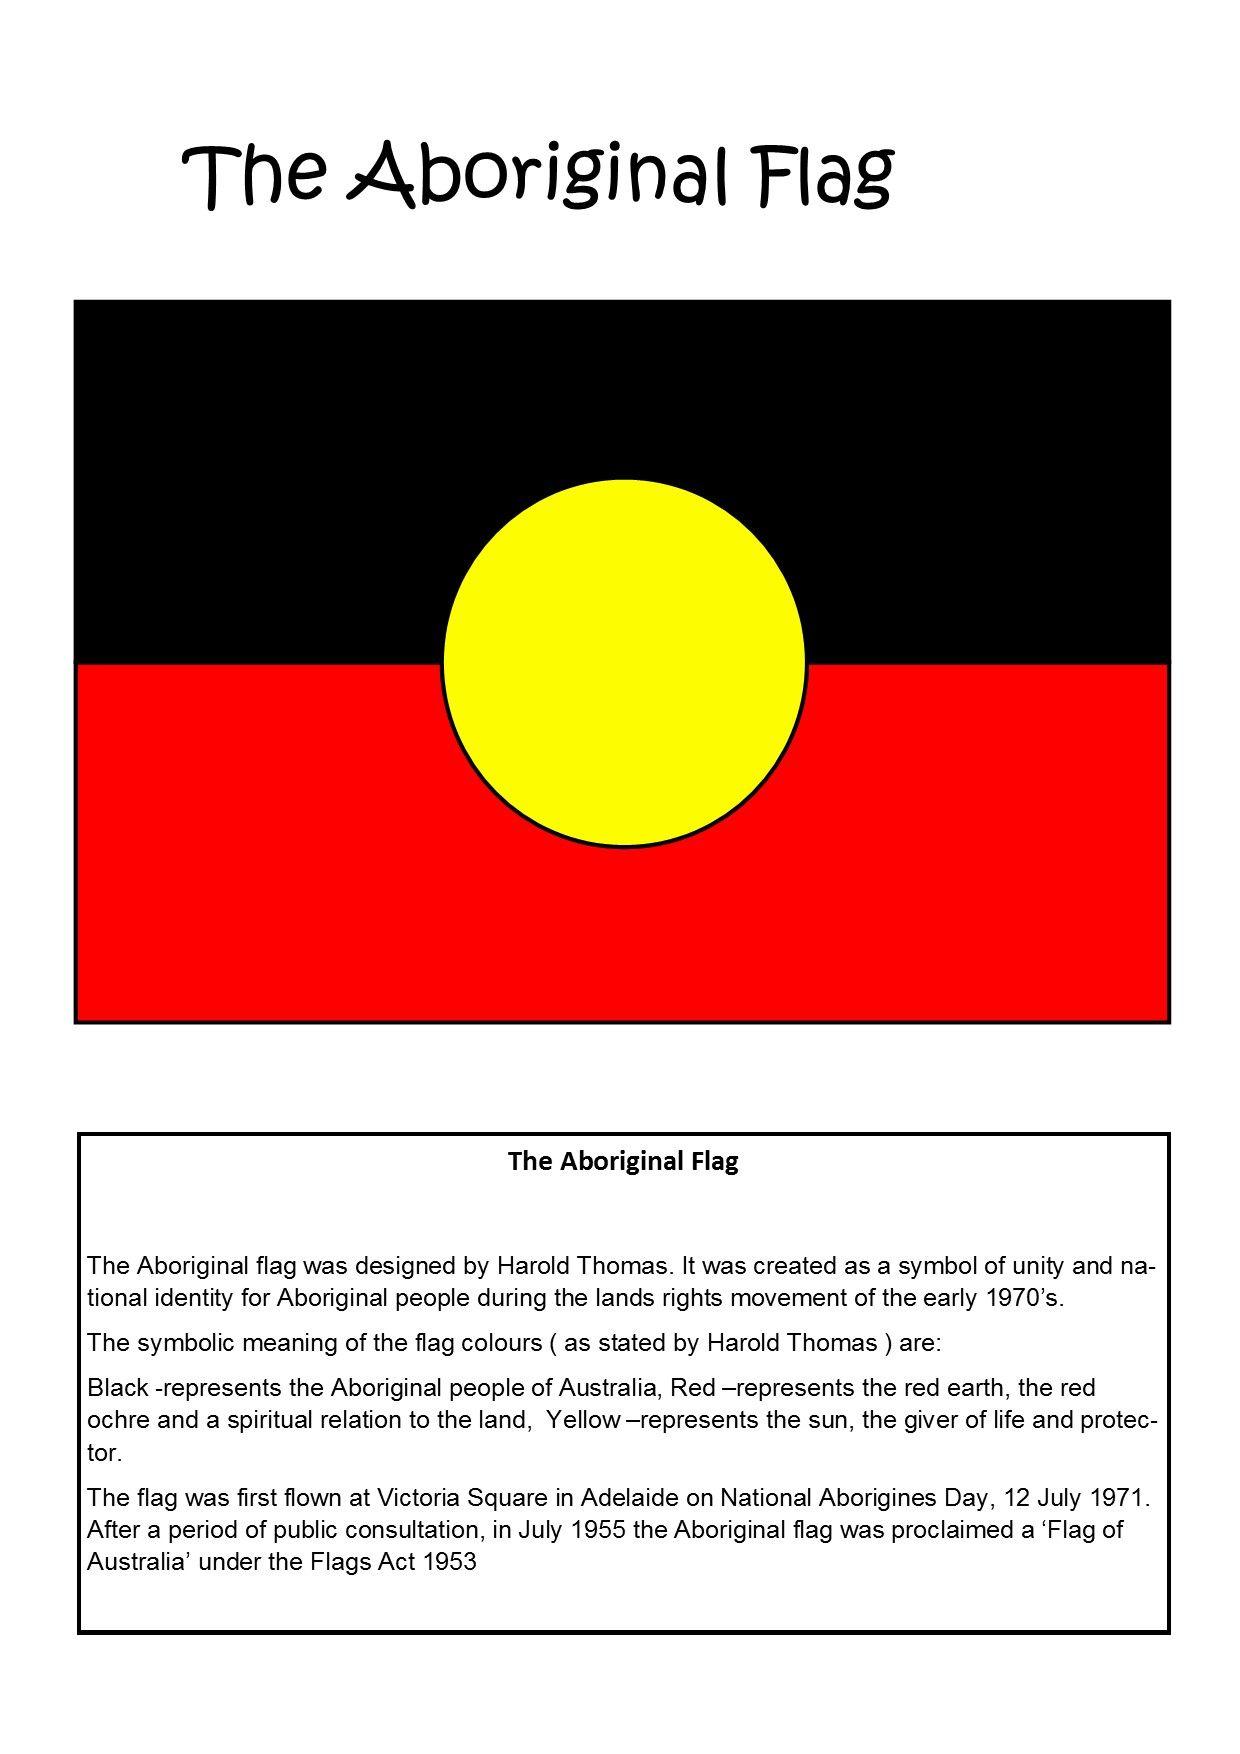 Pin By Travel Nerd Nici On Australia Pinterest Aboriginal Flag